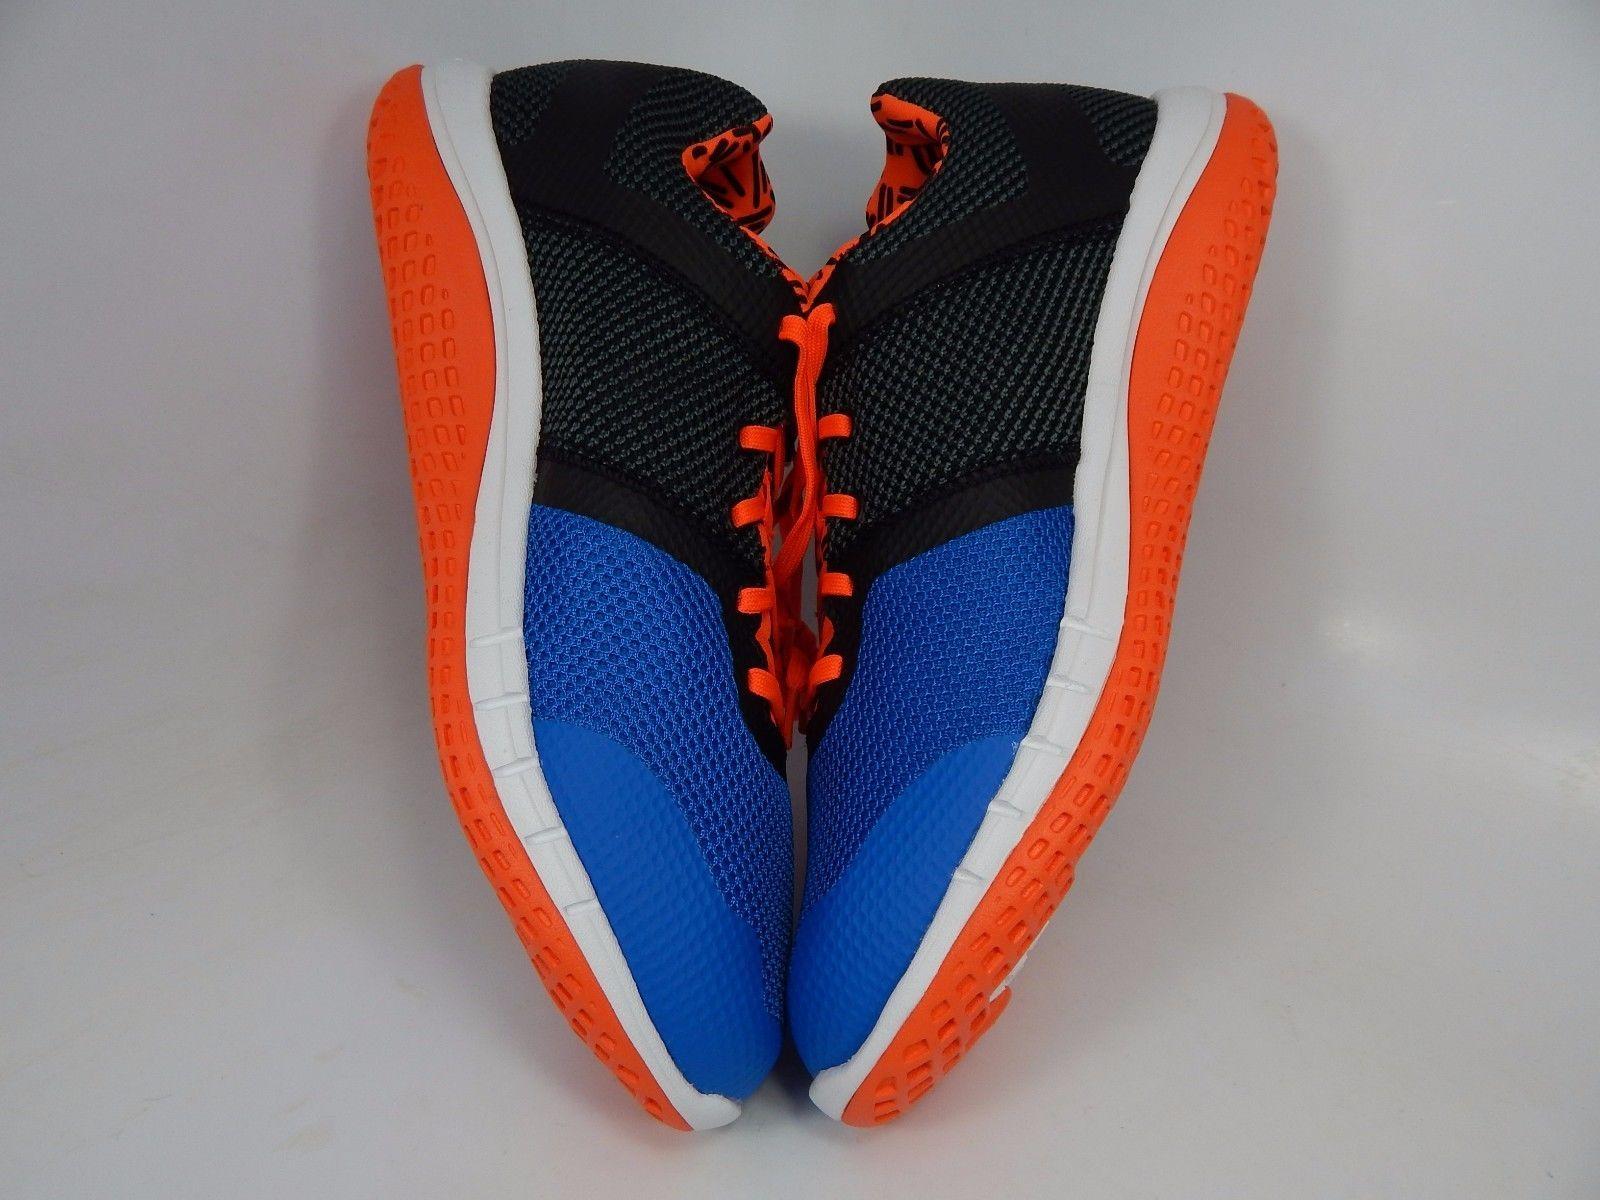 Reebok Zprint Run Gradient Boy's Men's Running Shoes Size US 7 Y EU 39 AR2120